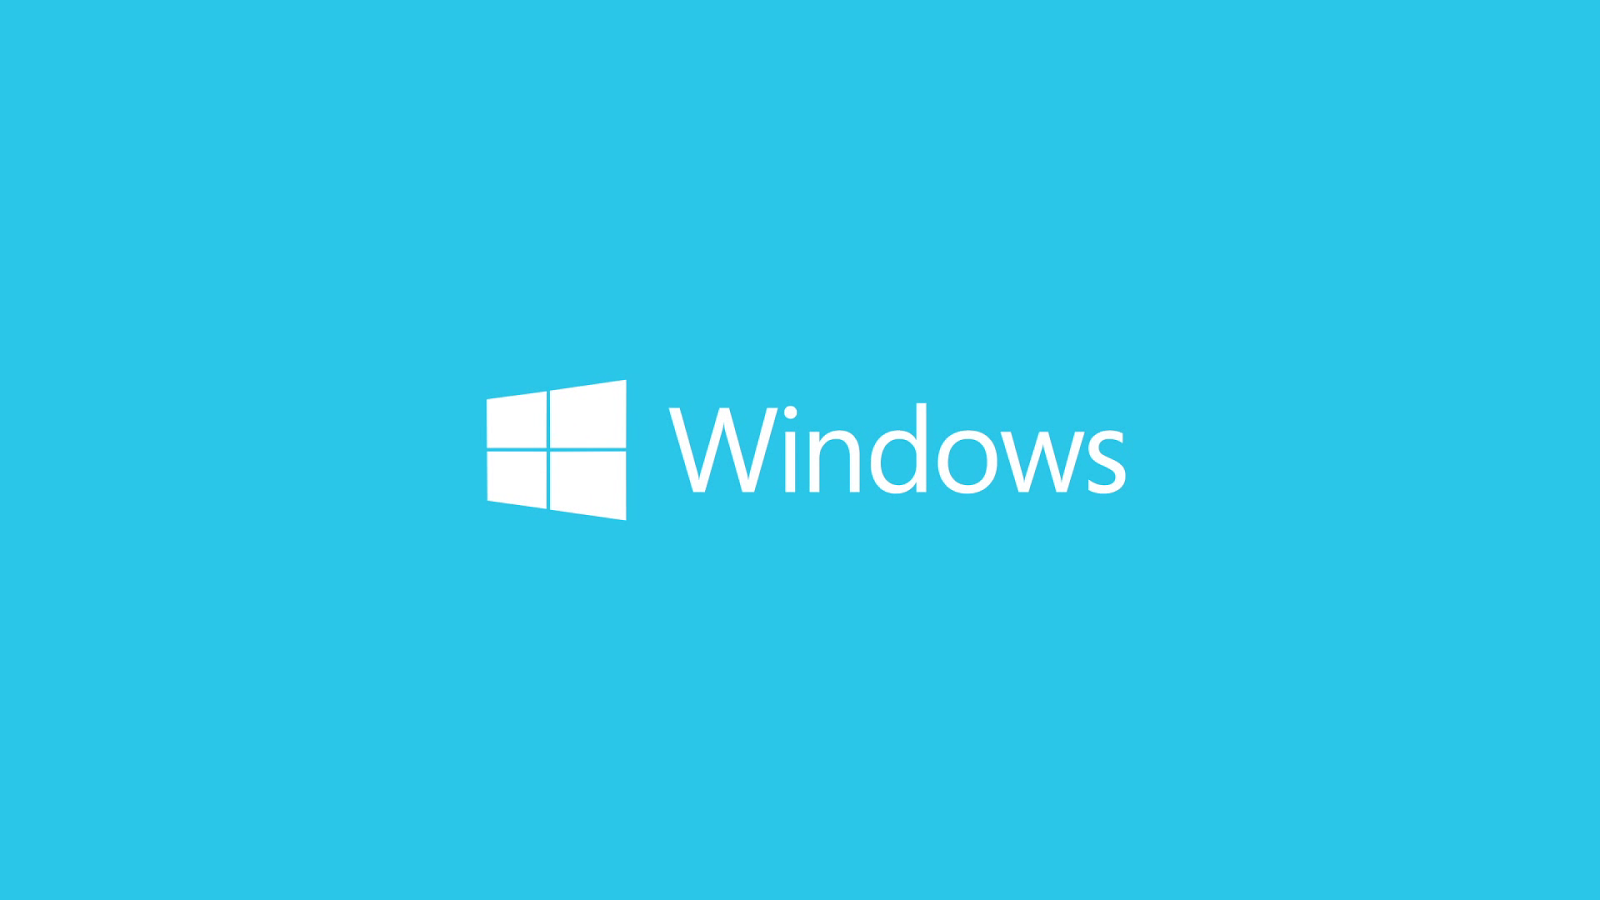 shared wallpaper windows - photo #35